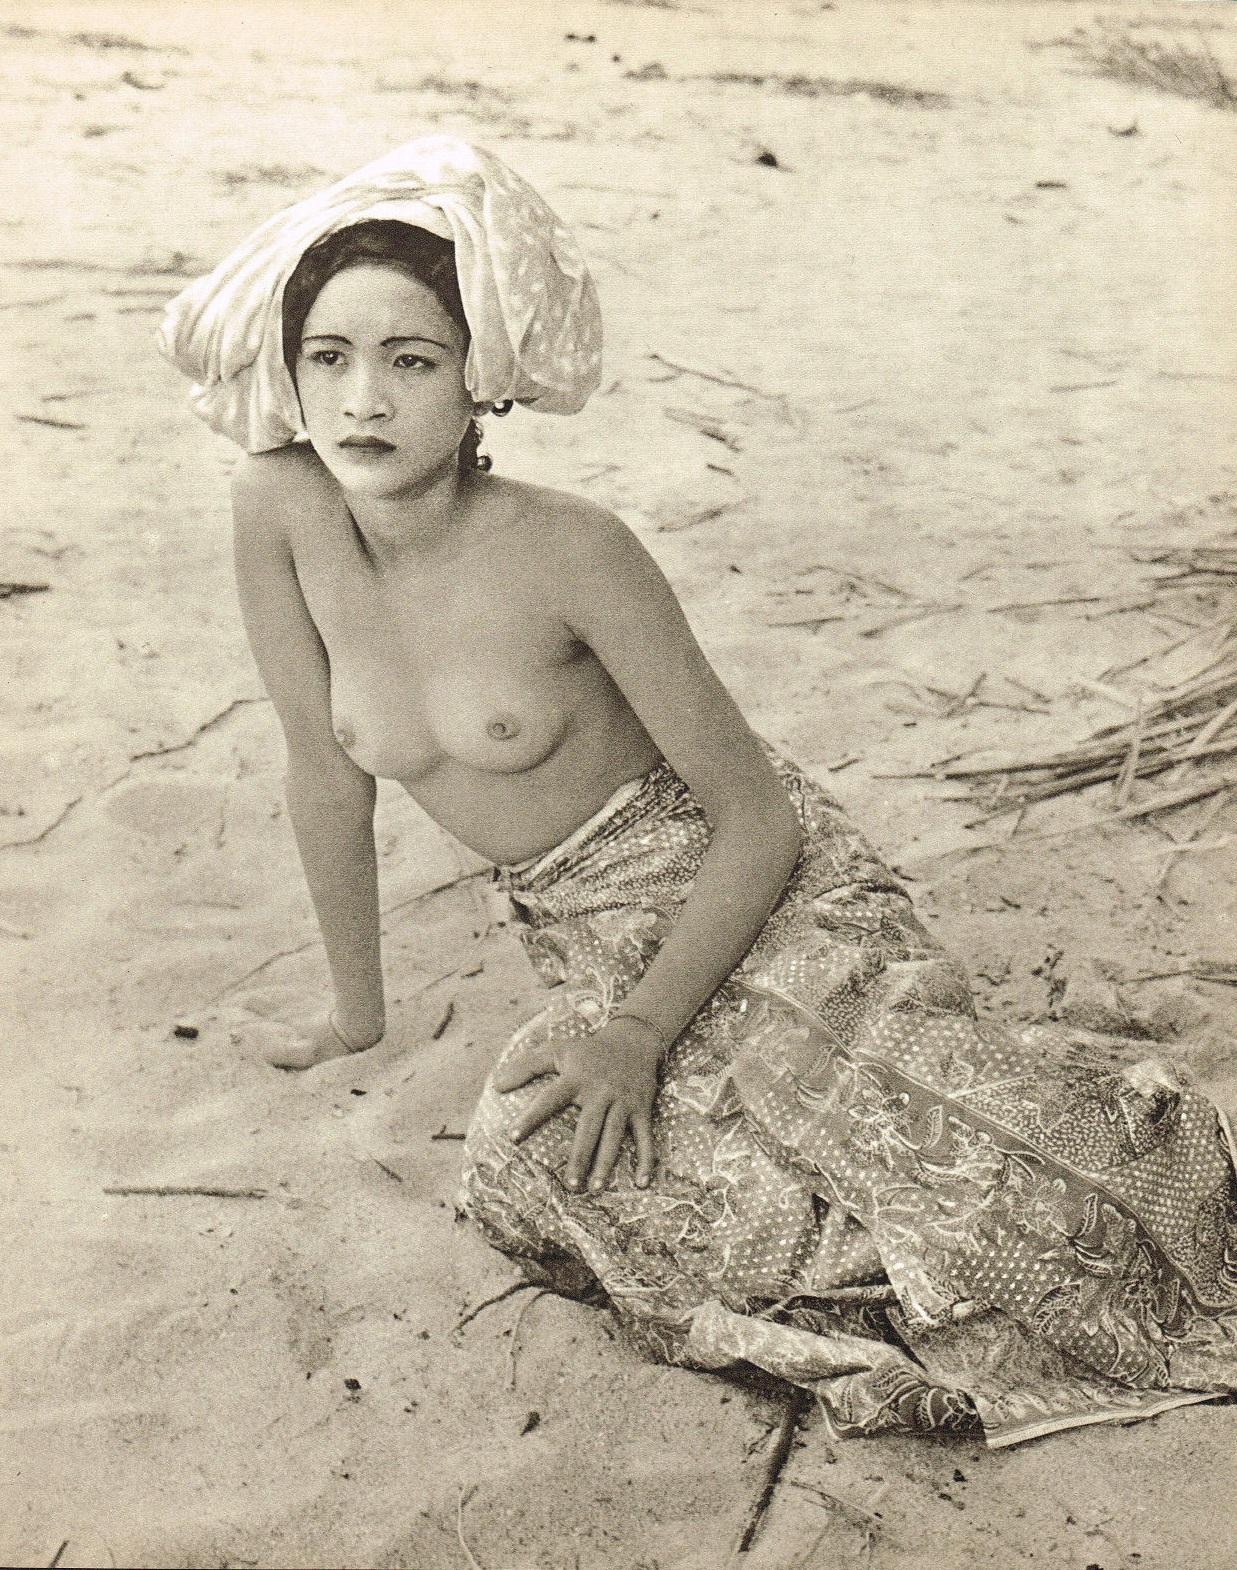 John Everard- Malay woman semi nude ,photogravure 1950 Oriental Model Published by Robert Hale Ltd., London in 1955.